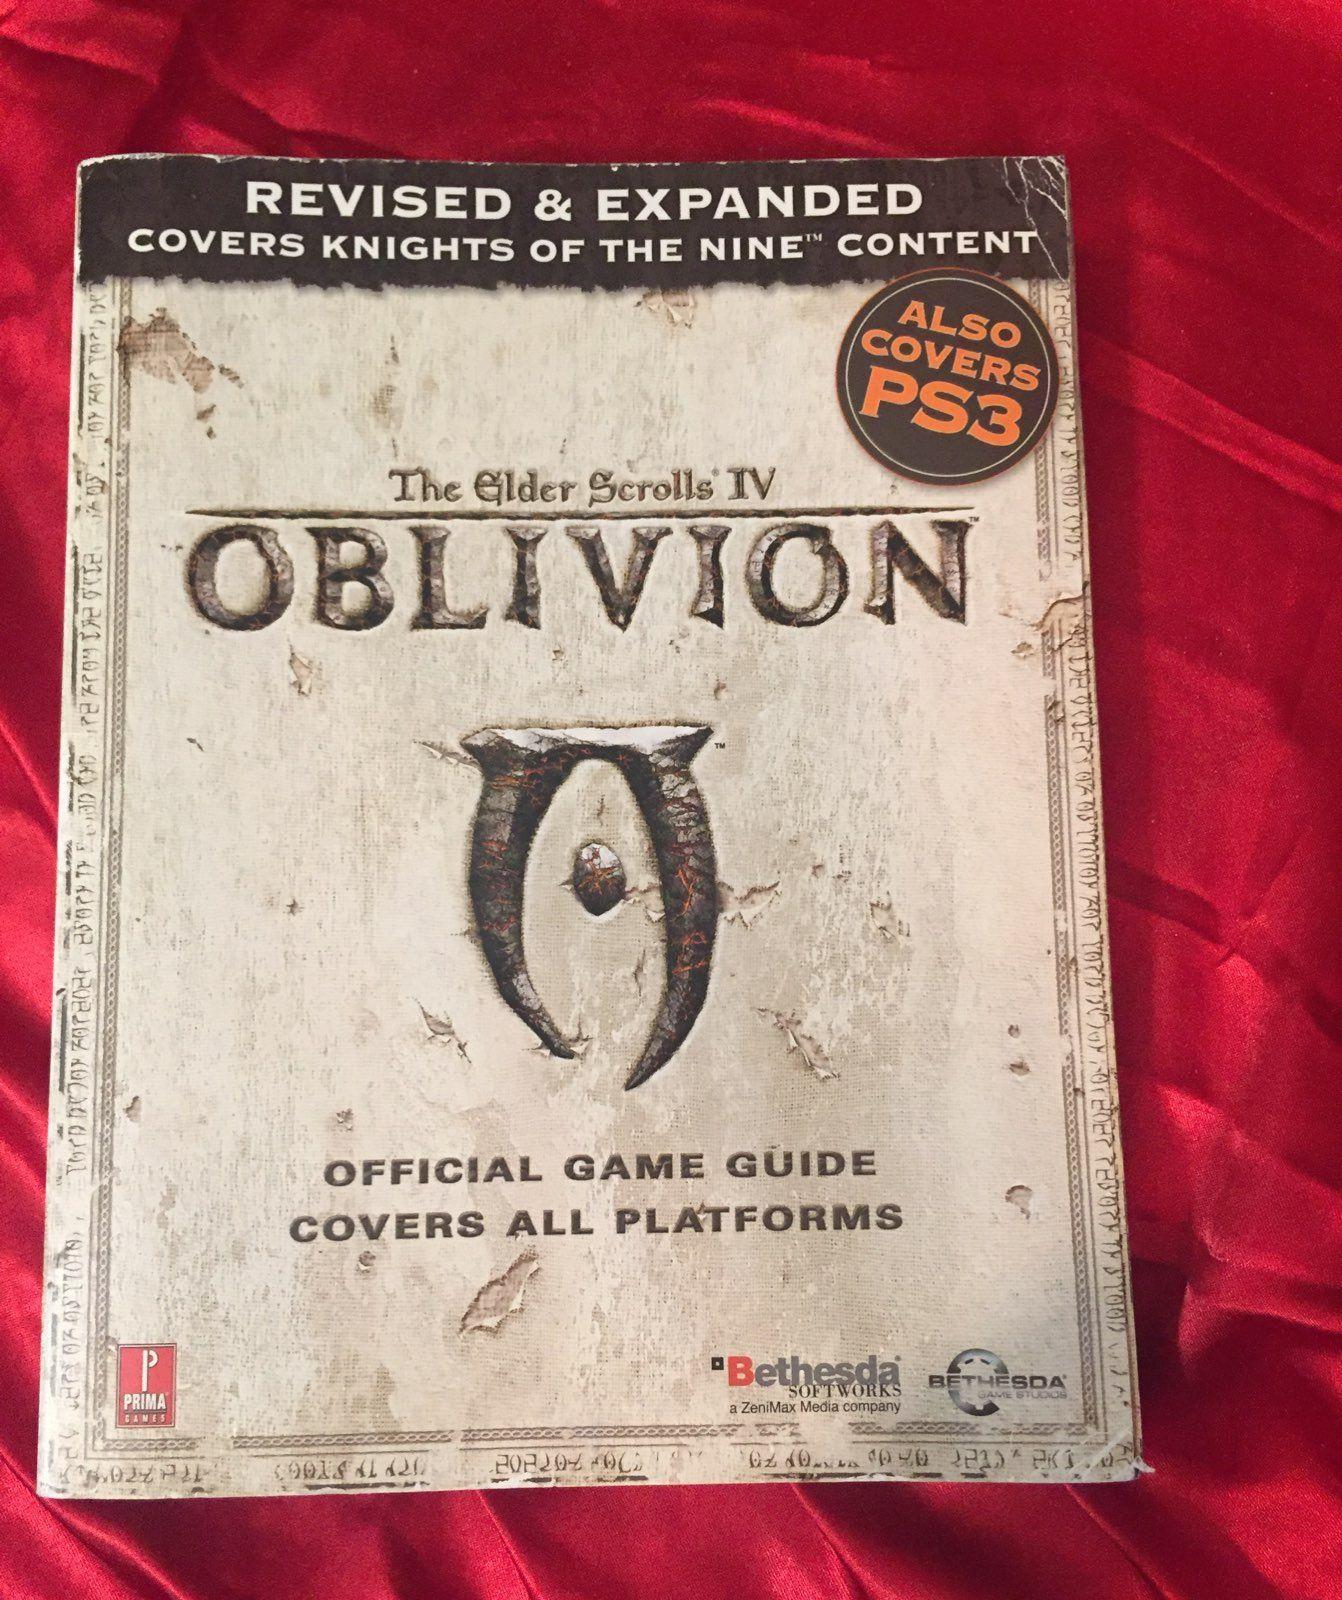 elder scrolls oblivion iv strategy guide mercari buy sell rh pinterest com Oblivion Weapons Guide Elder Scrolls Oblivion Guide.pdf